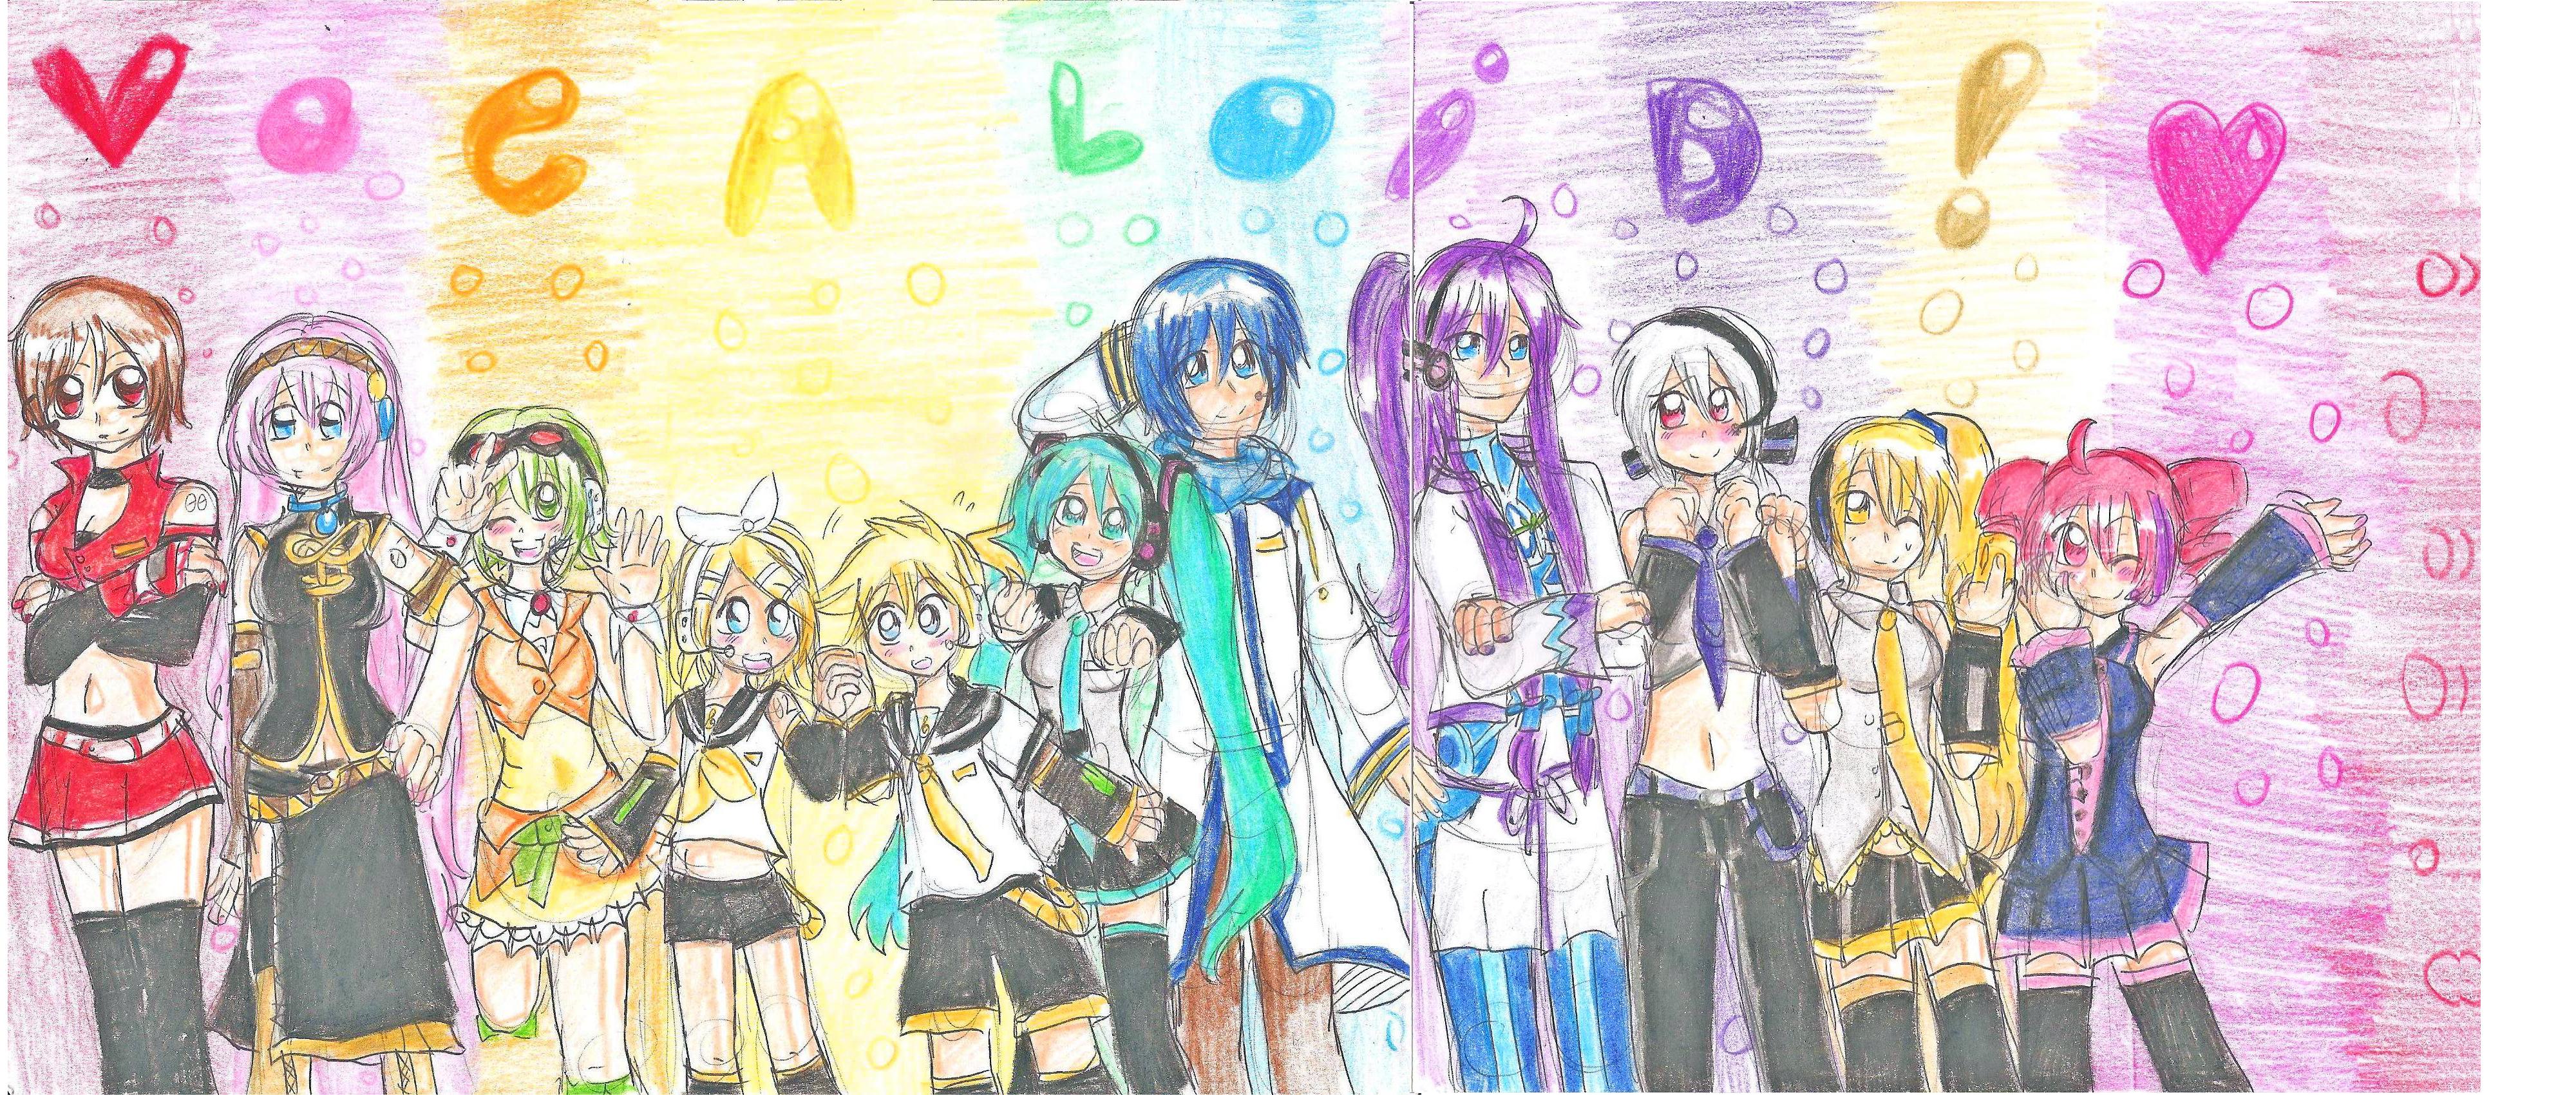 Vocaloid Chibi Group Wallpaper Anime Vocaloid Group